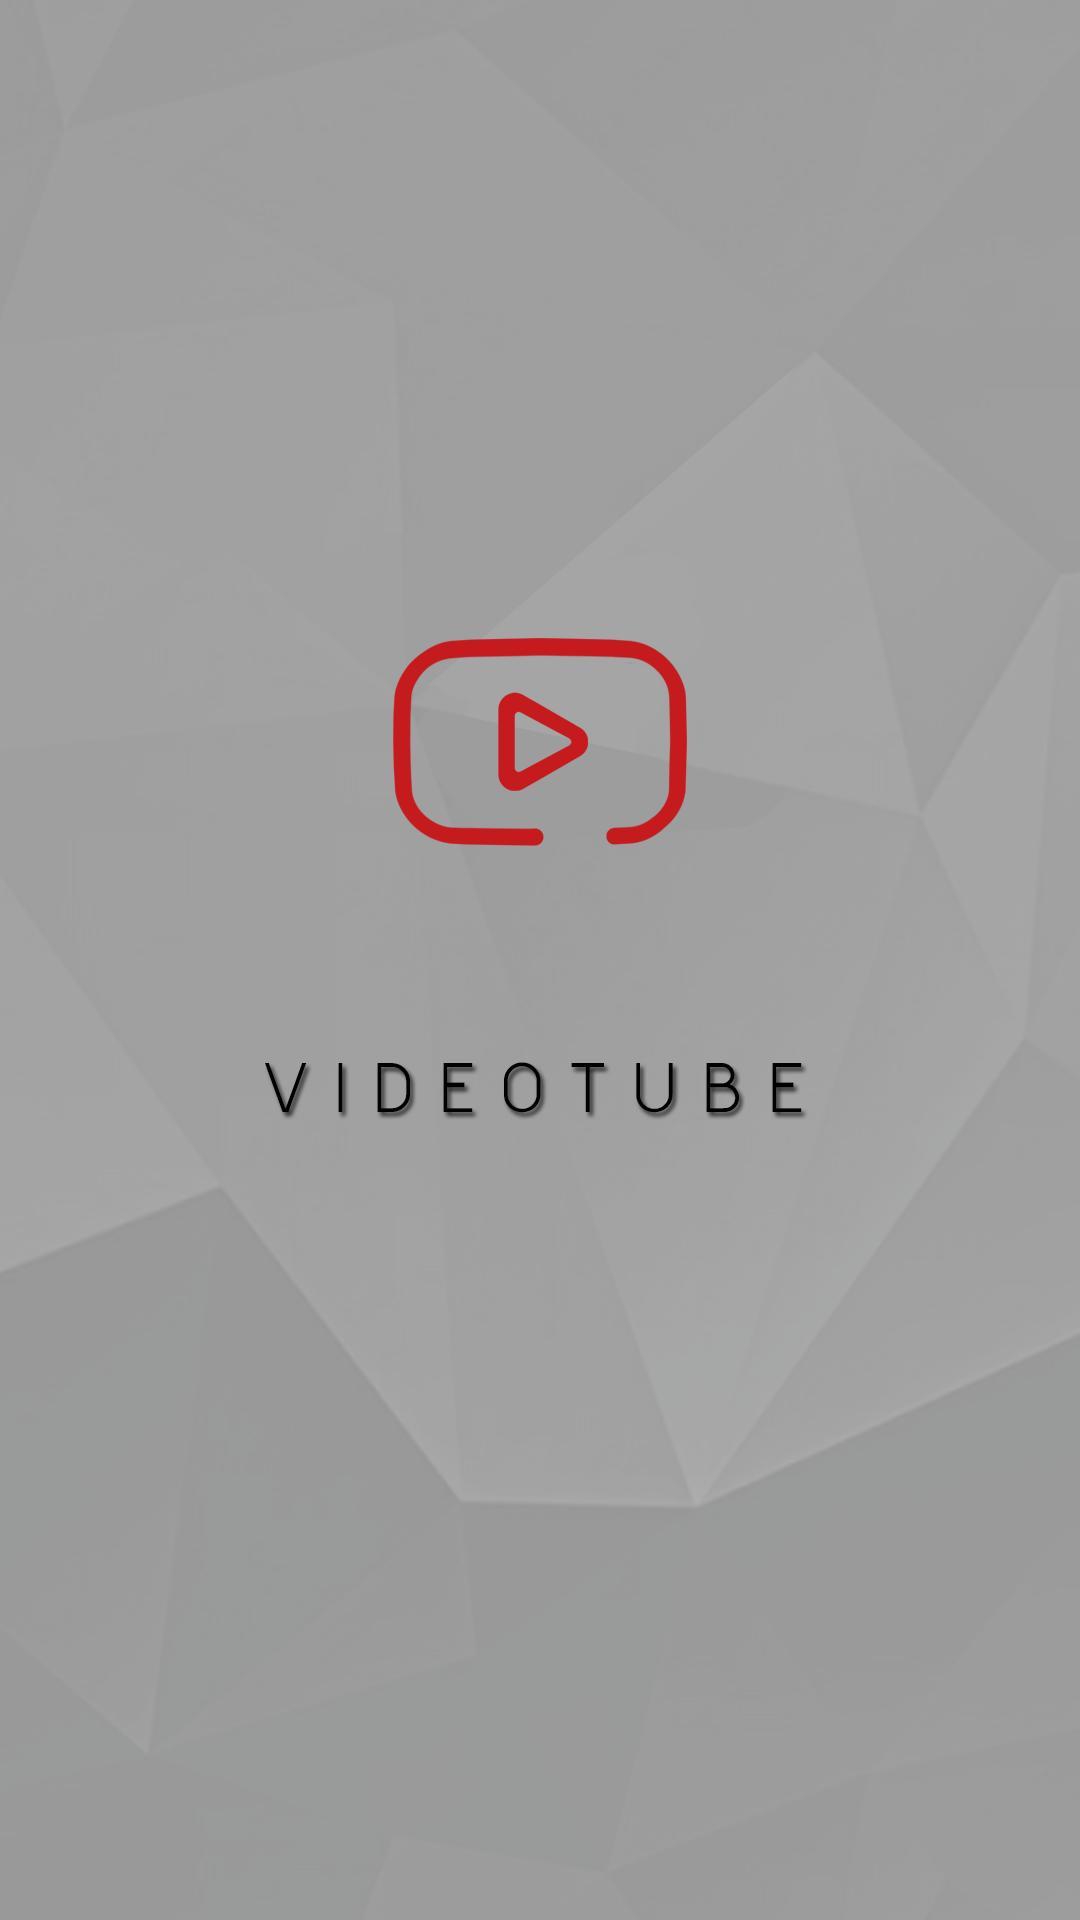 Pemutar Musik Latar Belakang Video Tube For Android Apk Download